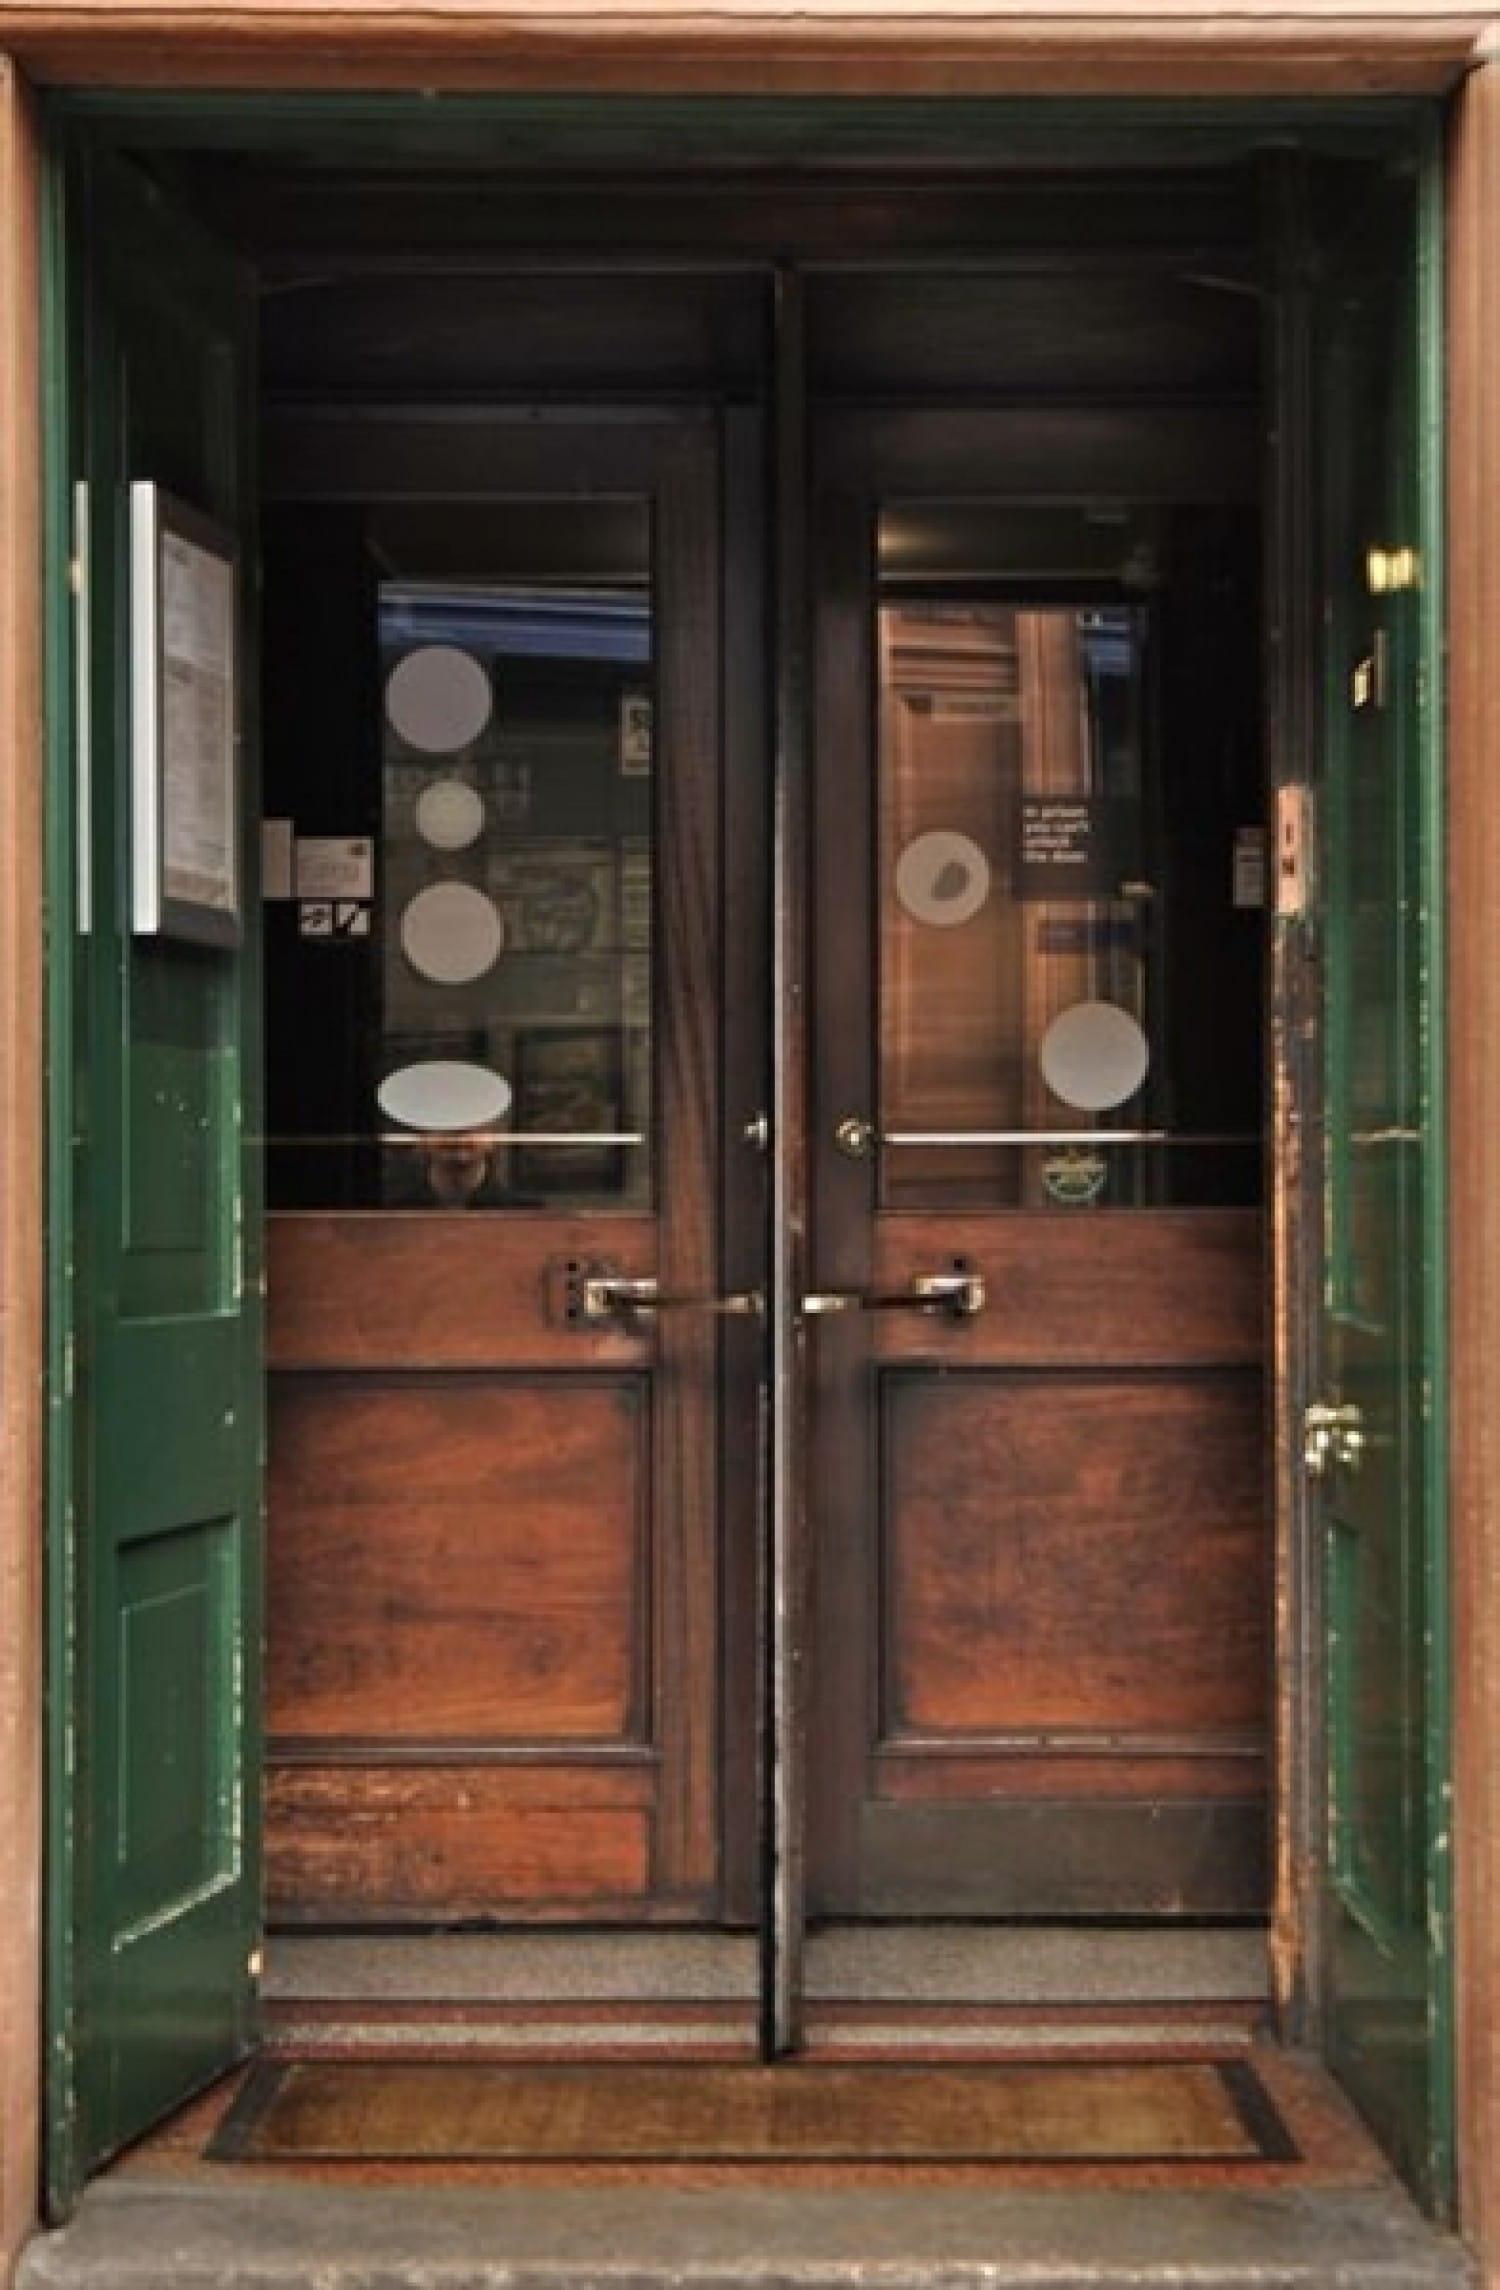 The old door, at Cafe Gandolfi